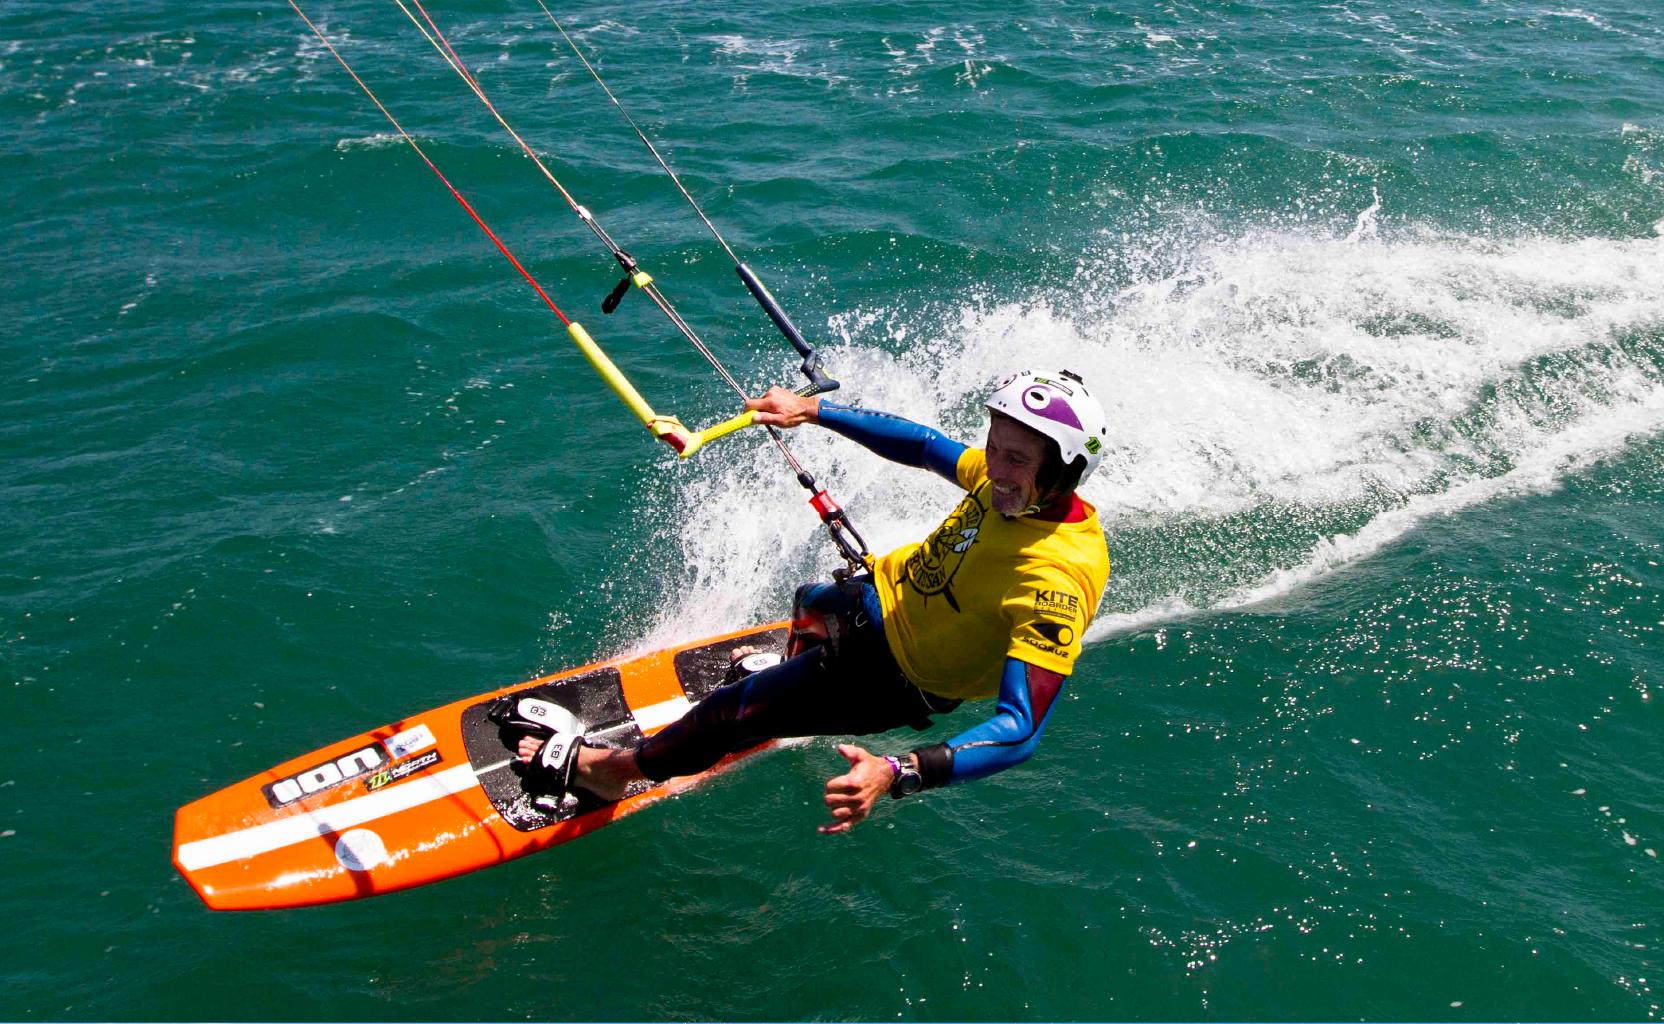 sport-de-glisse-kitesurf